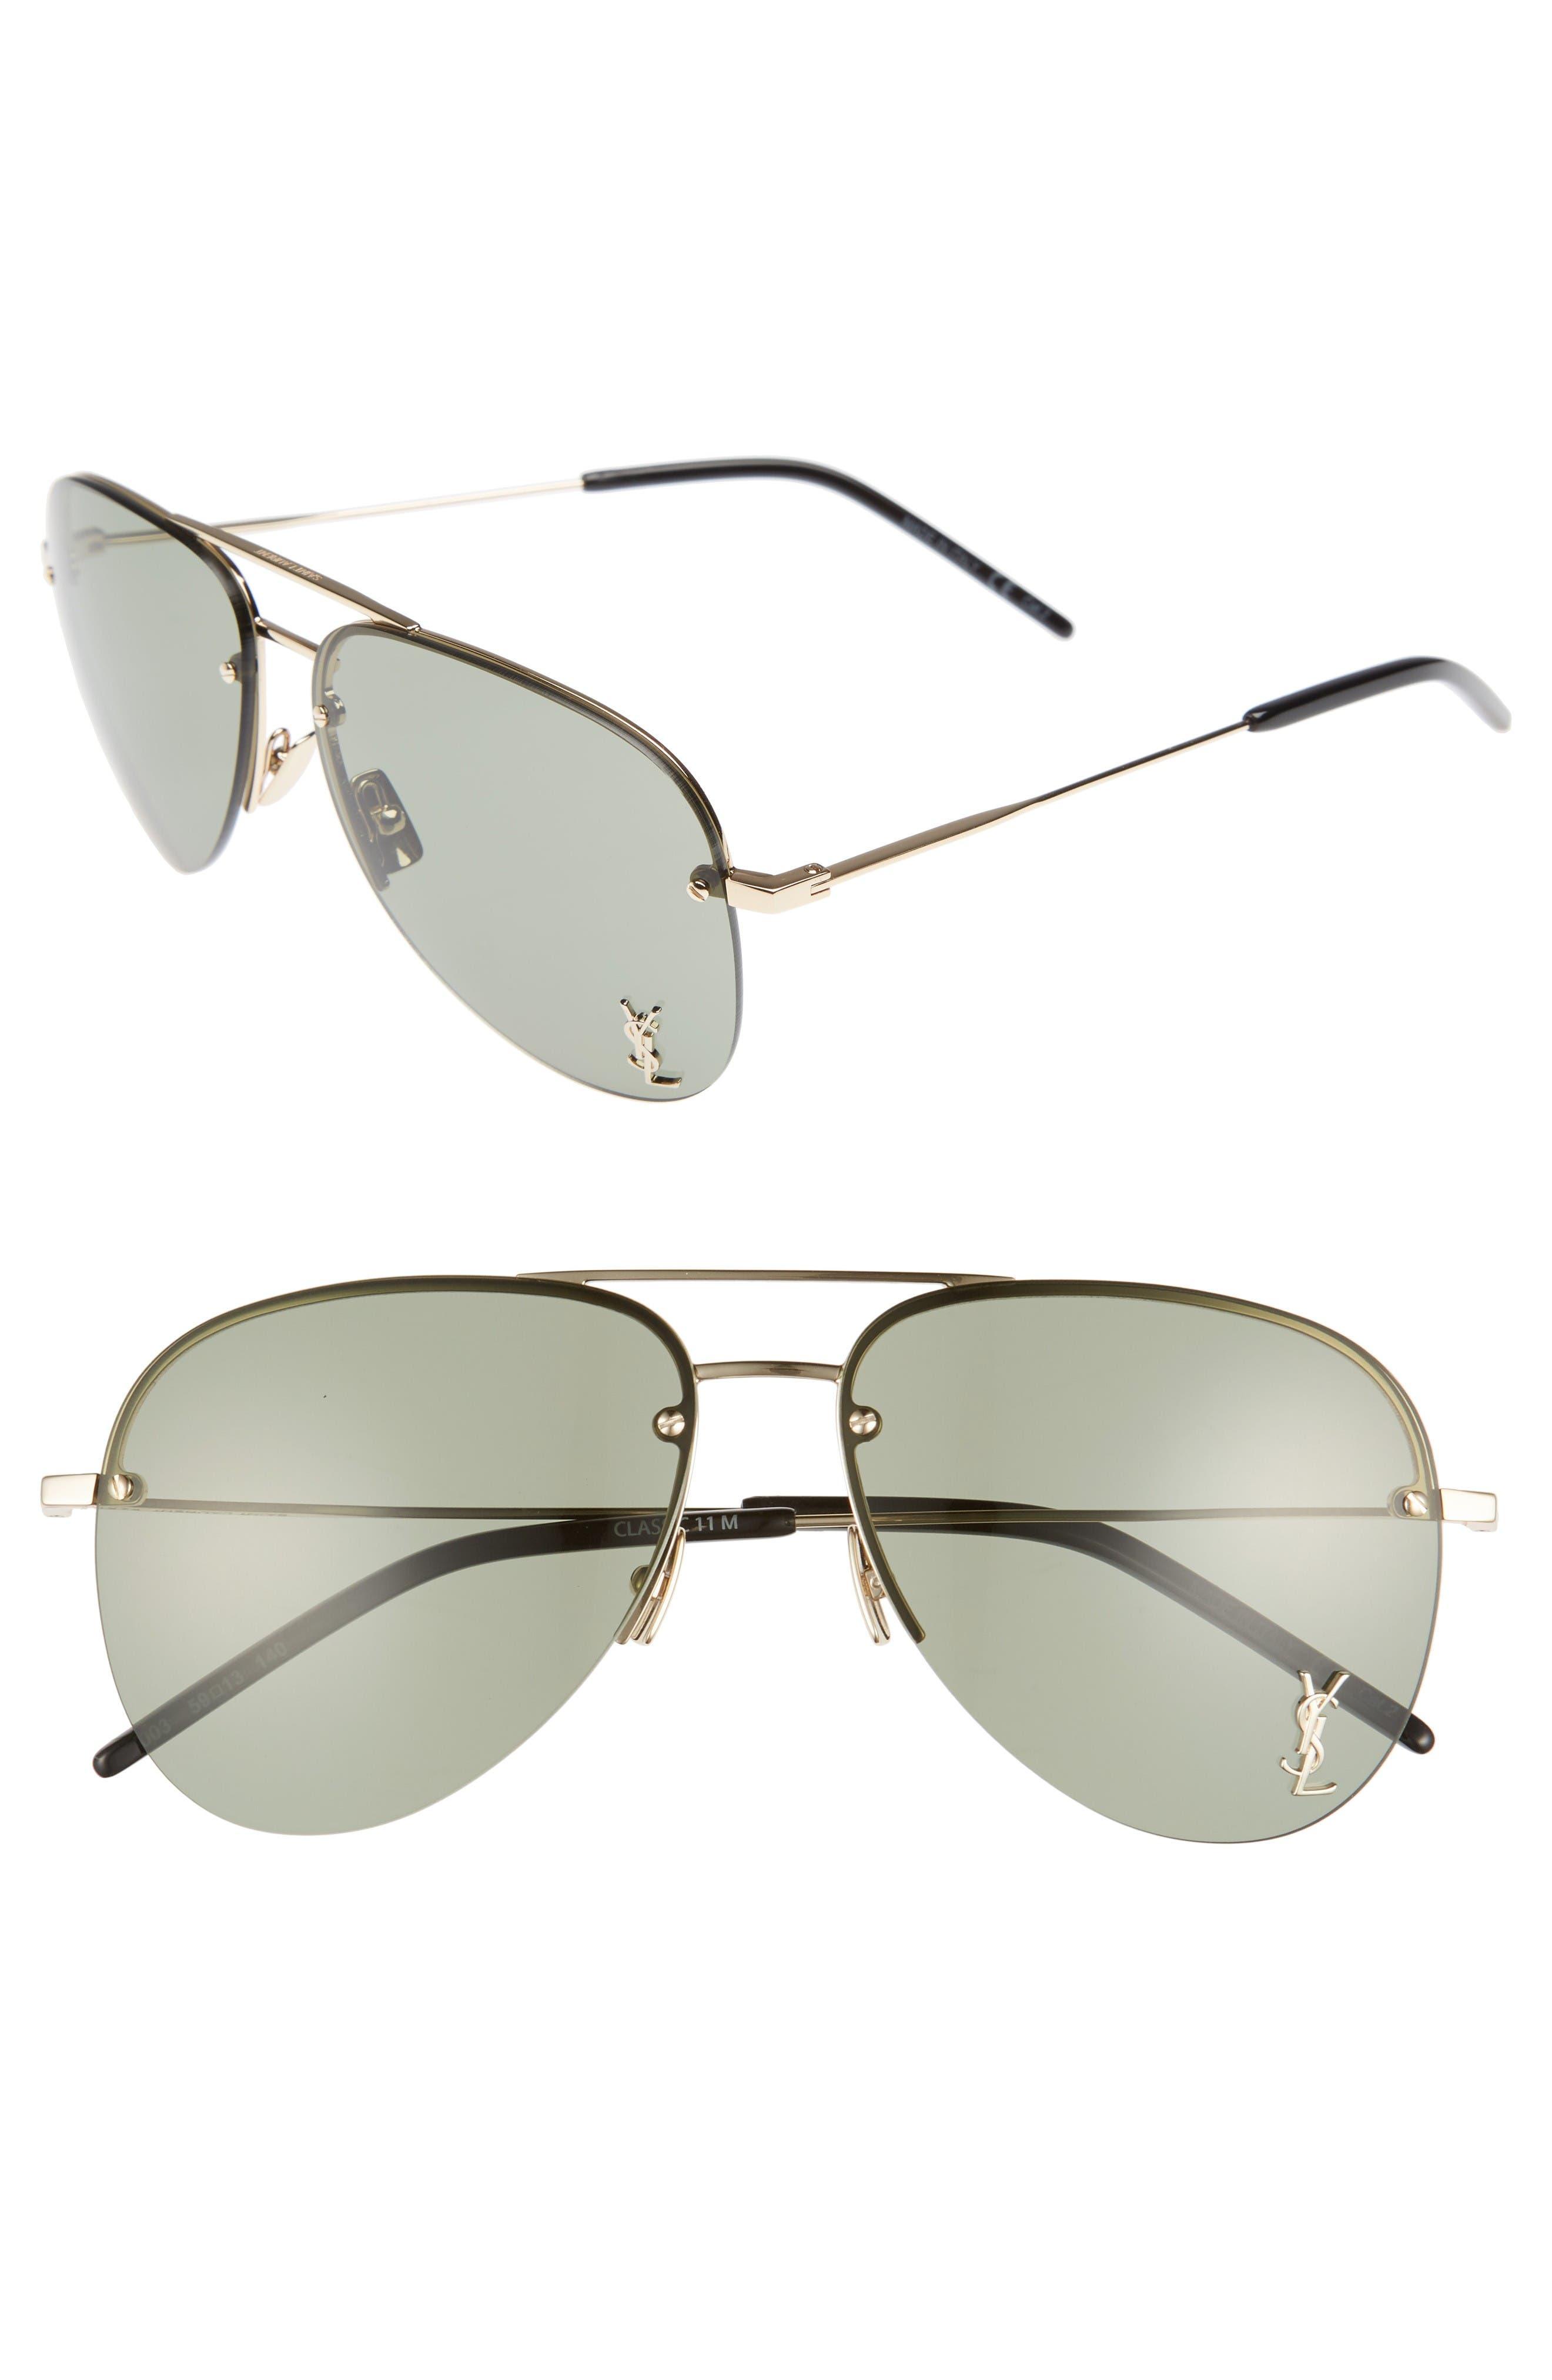 Main Image - Saint Laurent 59mm Aviator Sunglasses